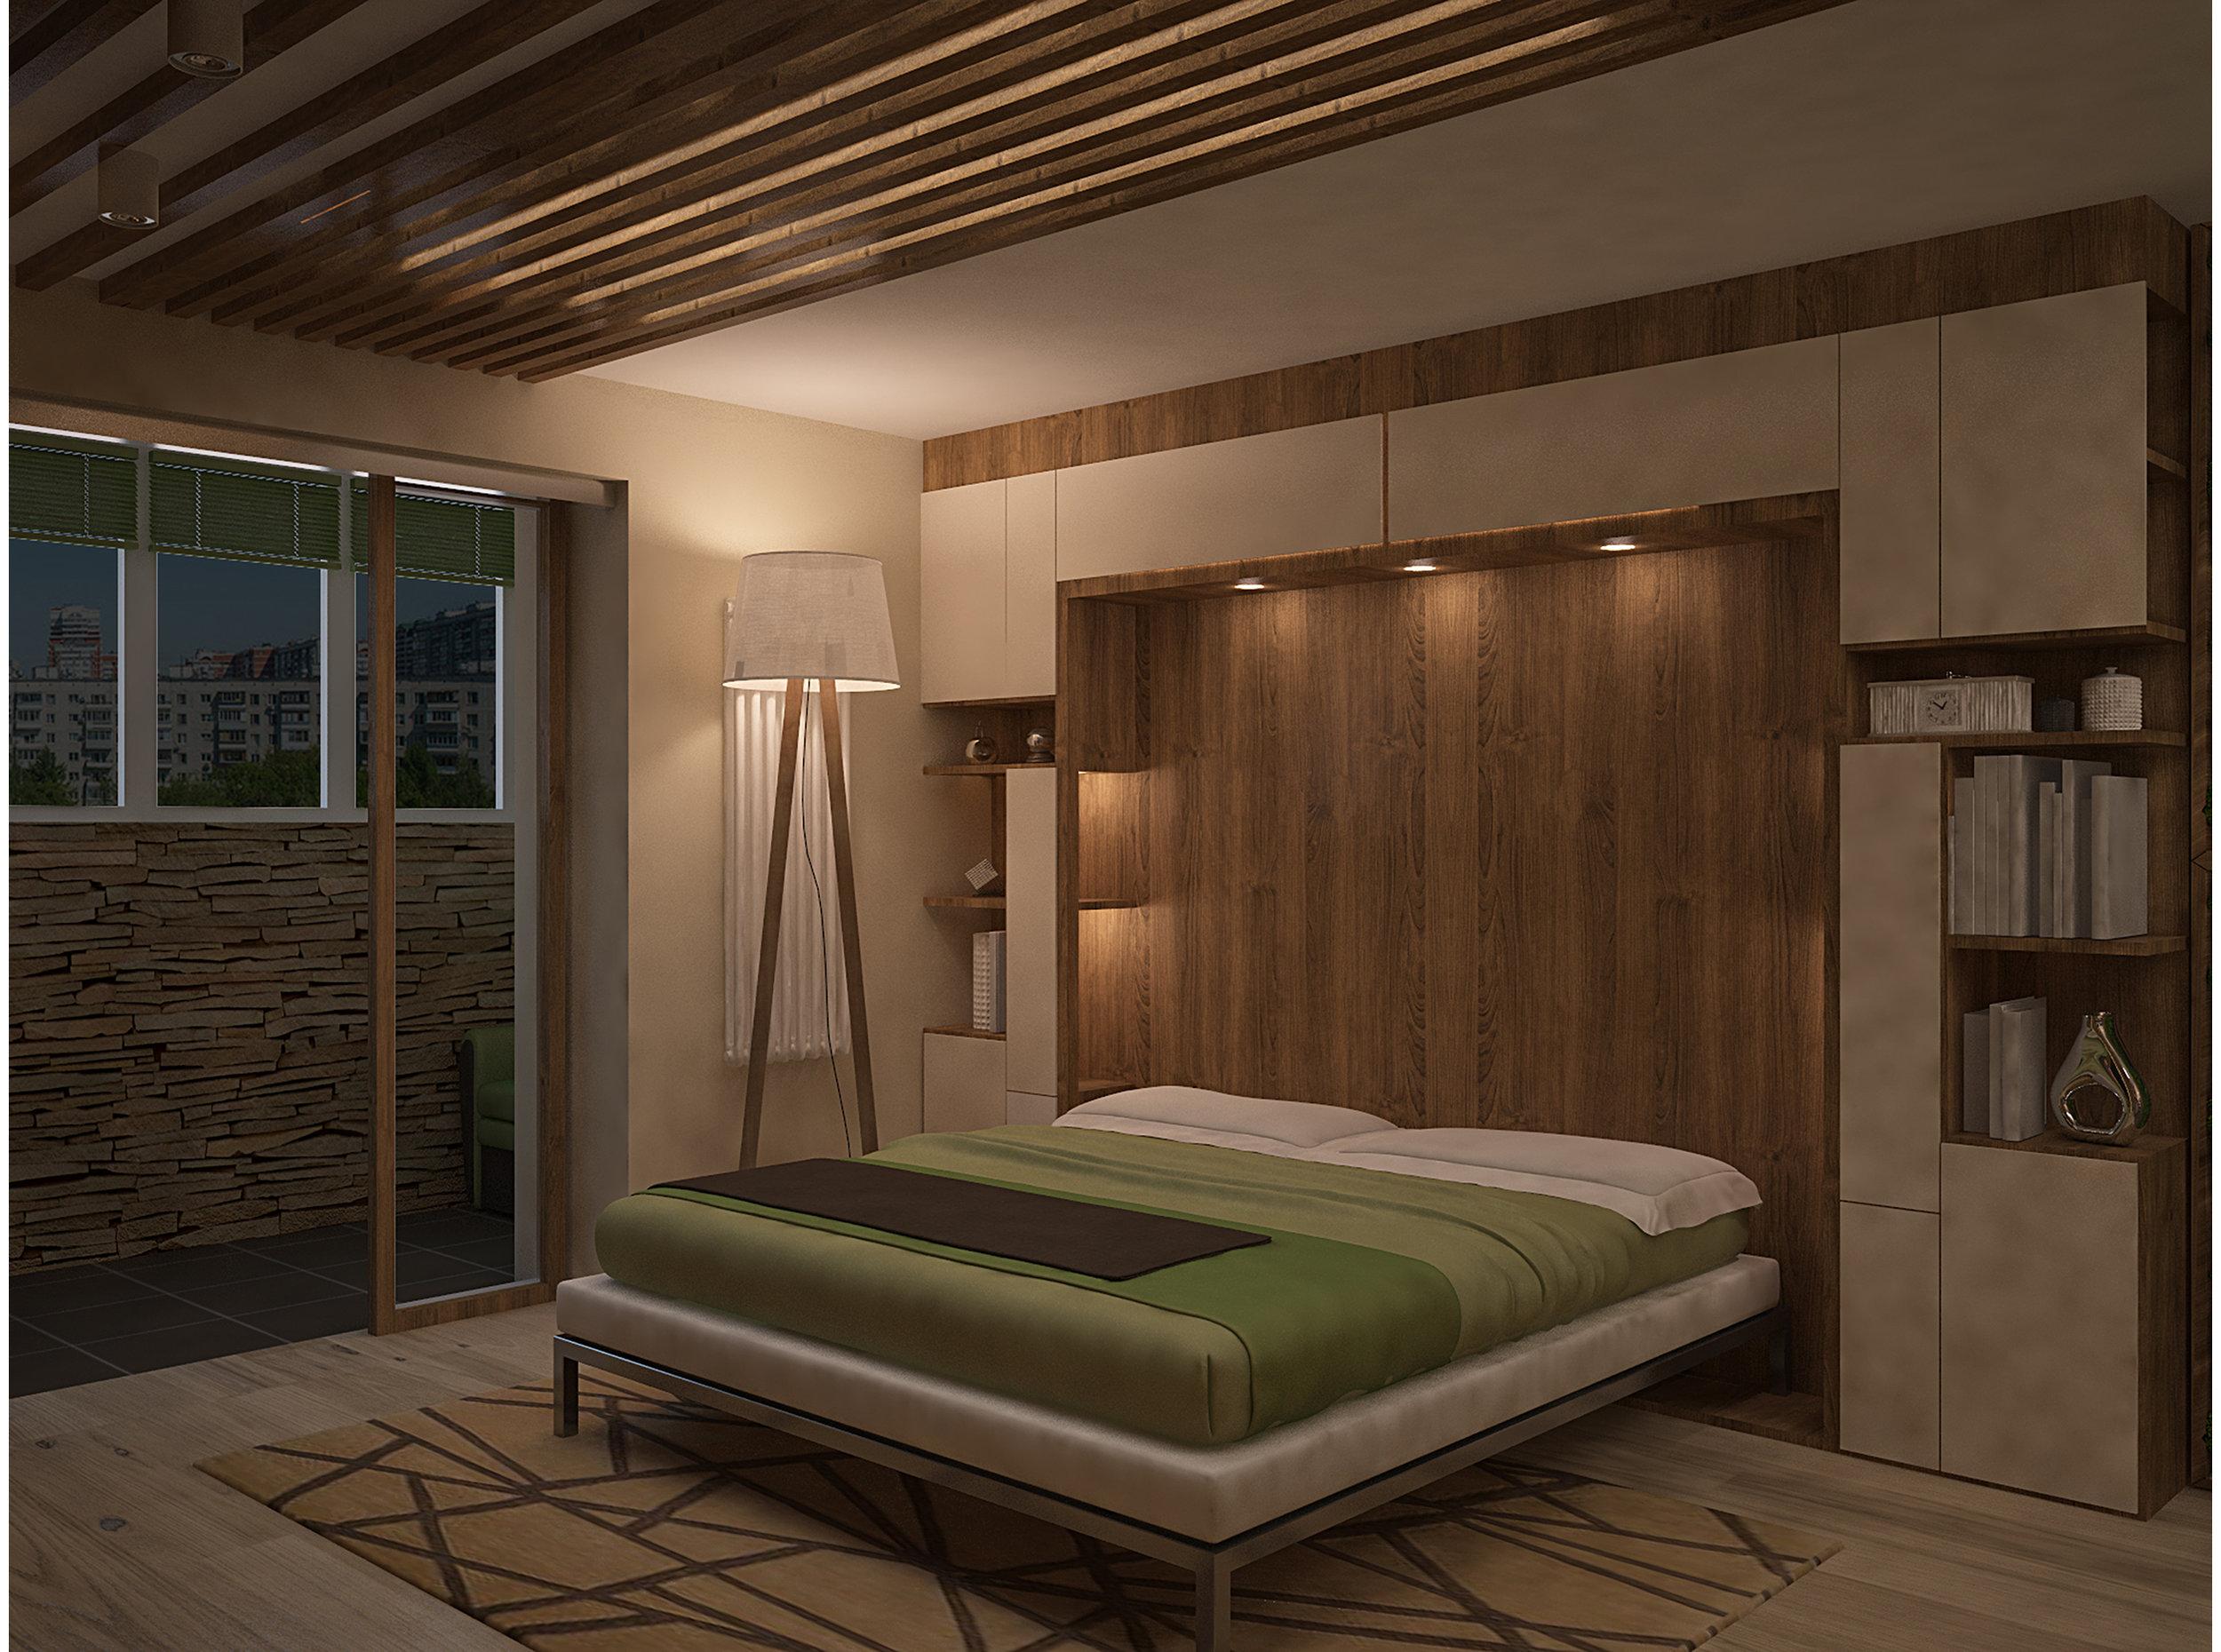 Copy of Living room transformed into bedroom